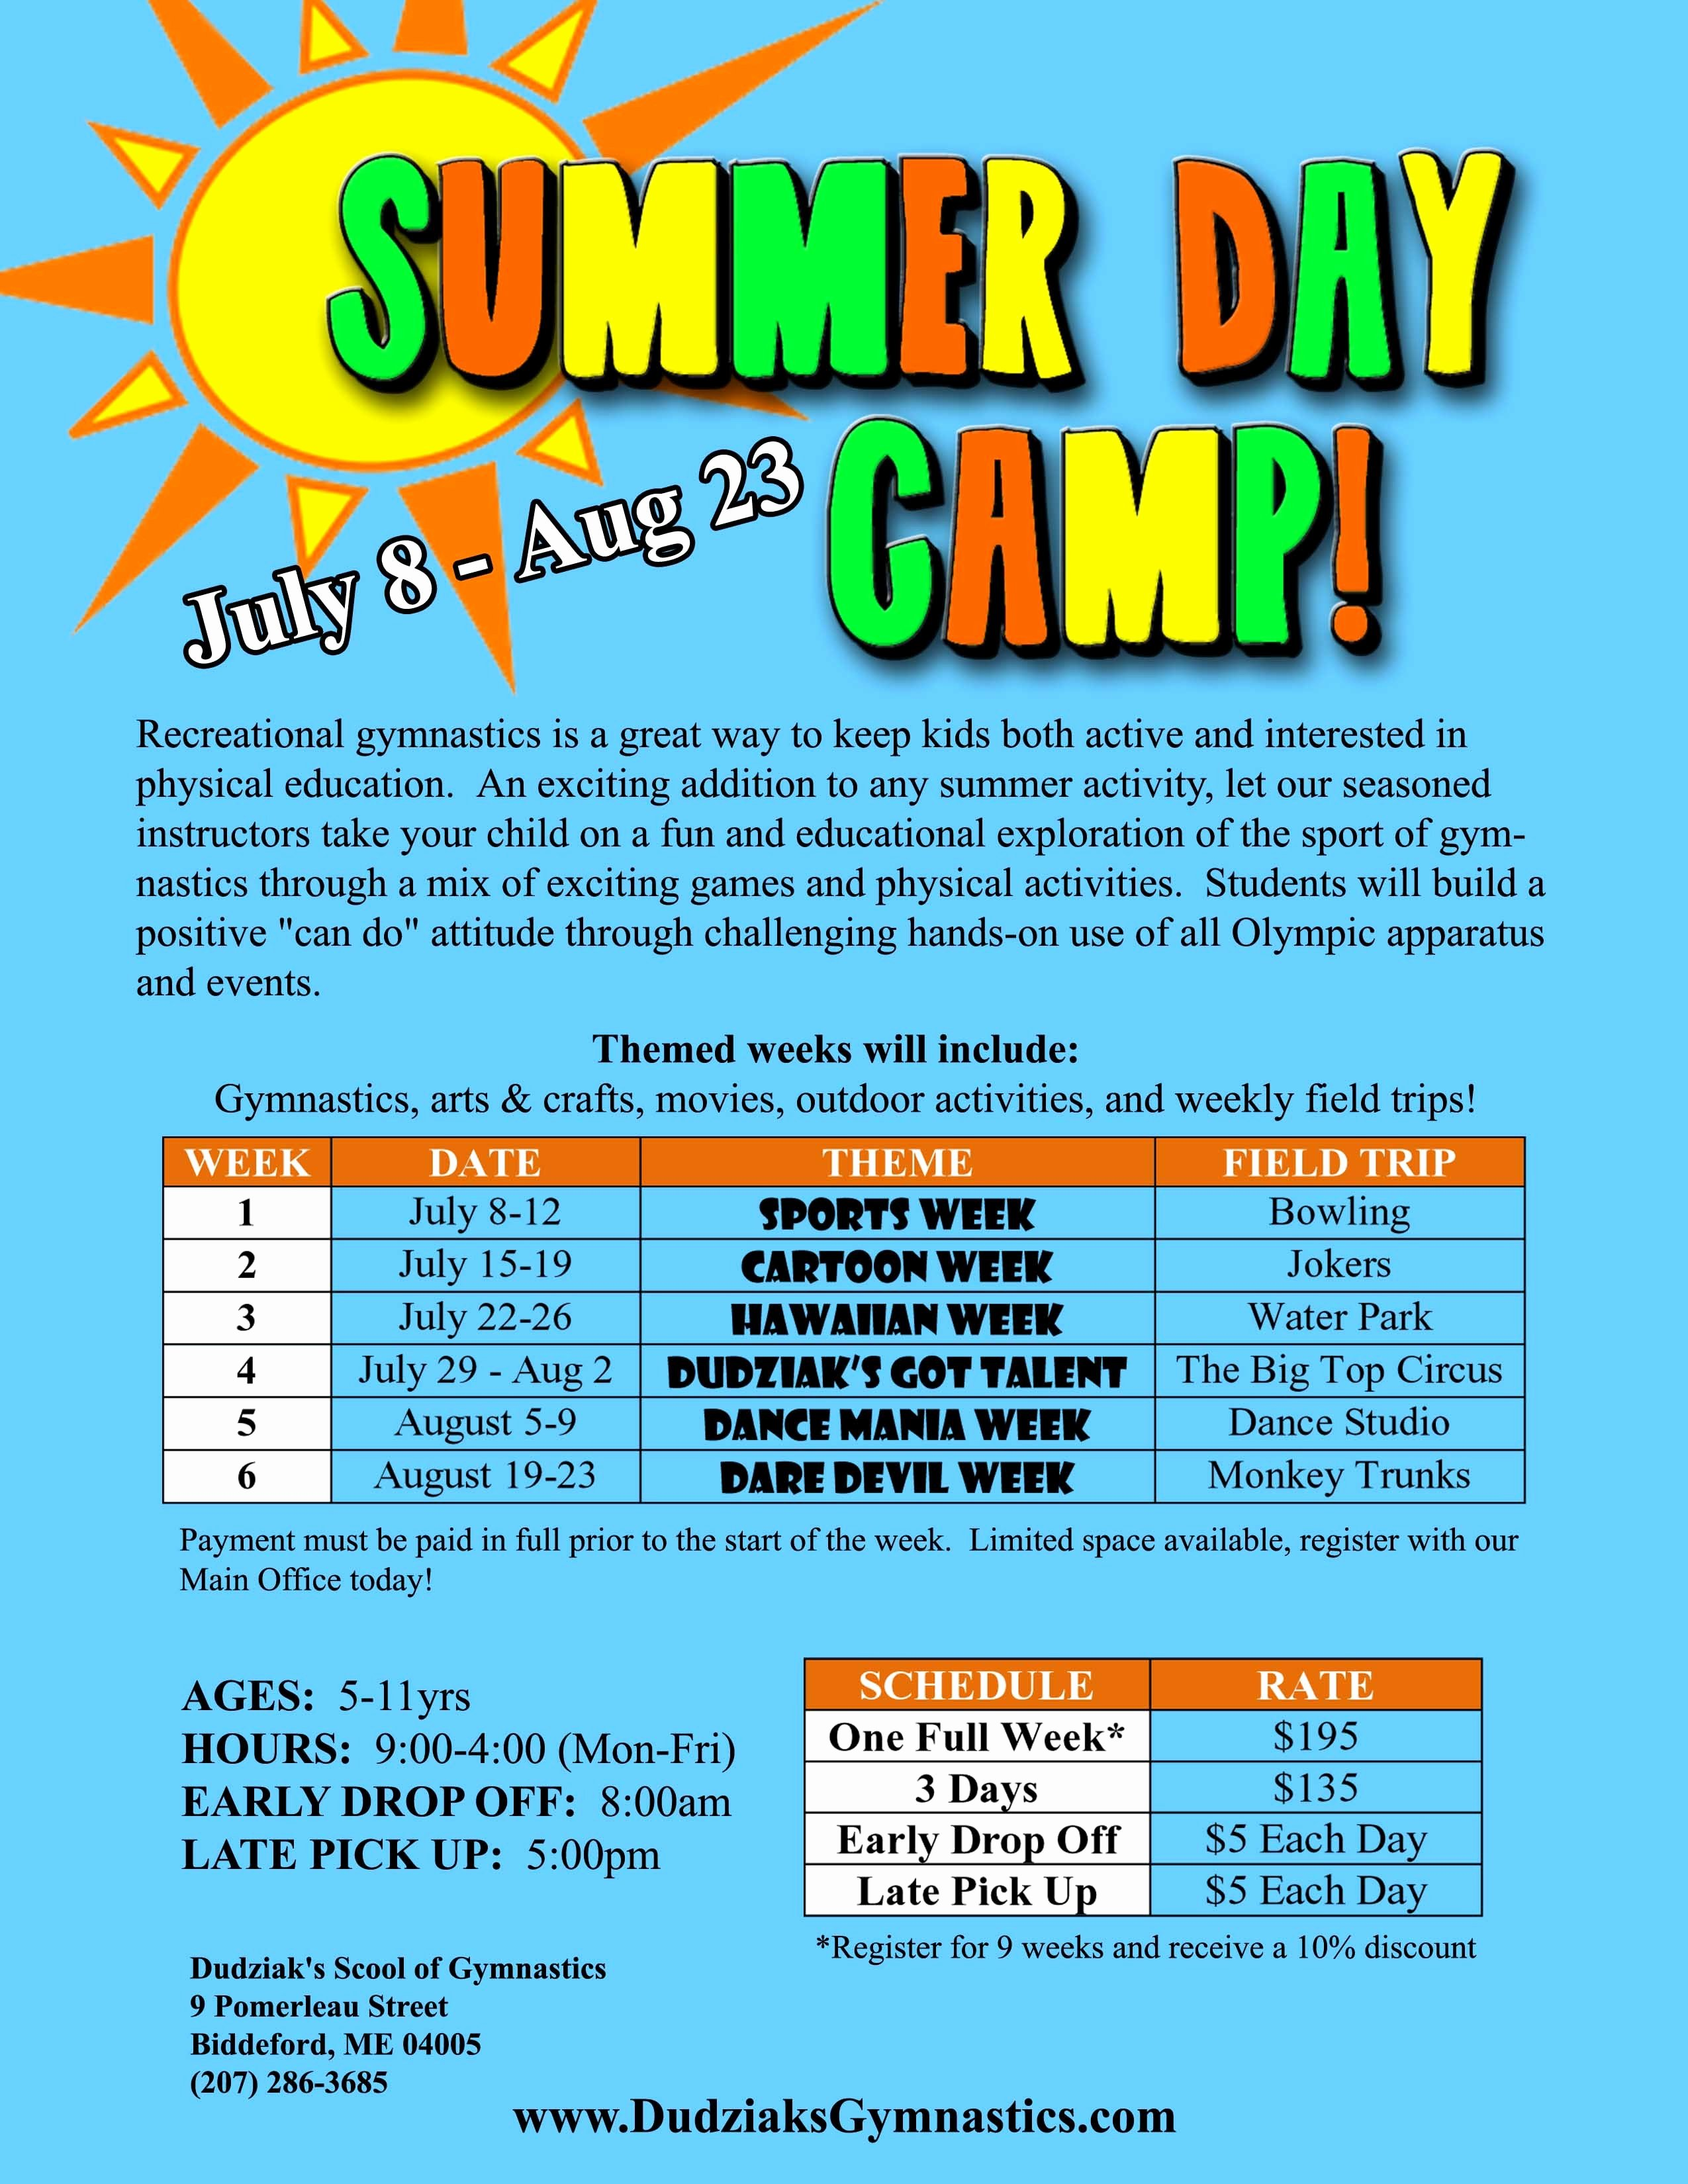 Free Summer Camp Flyer Template Inspirational Summer Camp Flyer Template Word